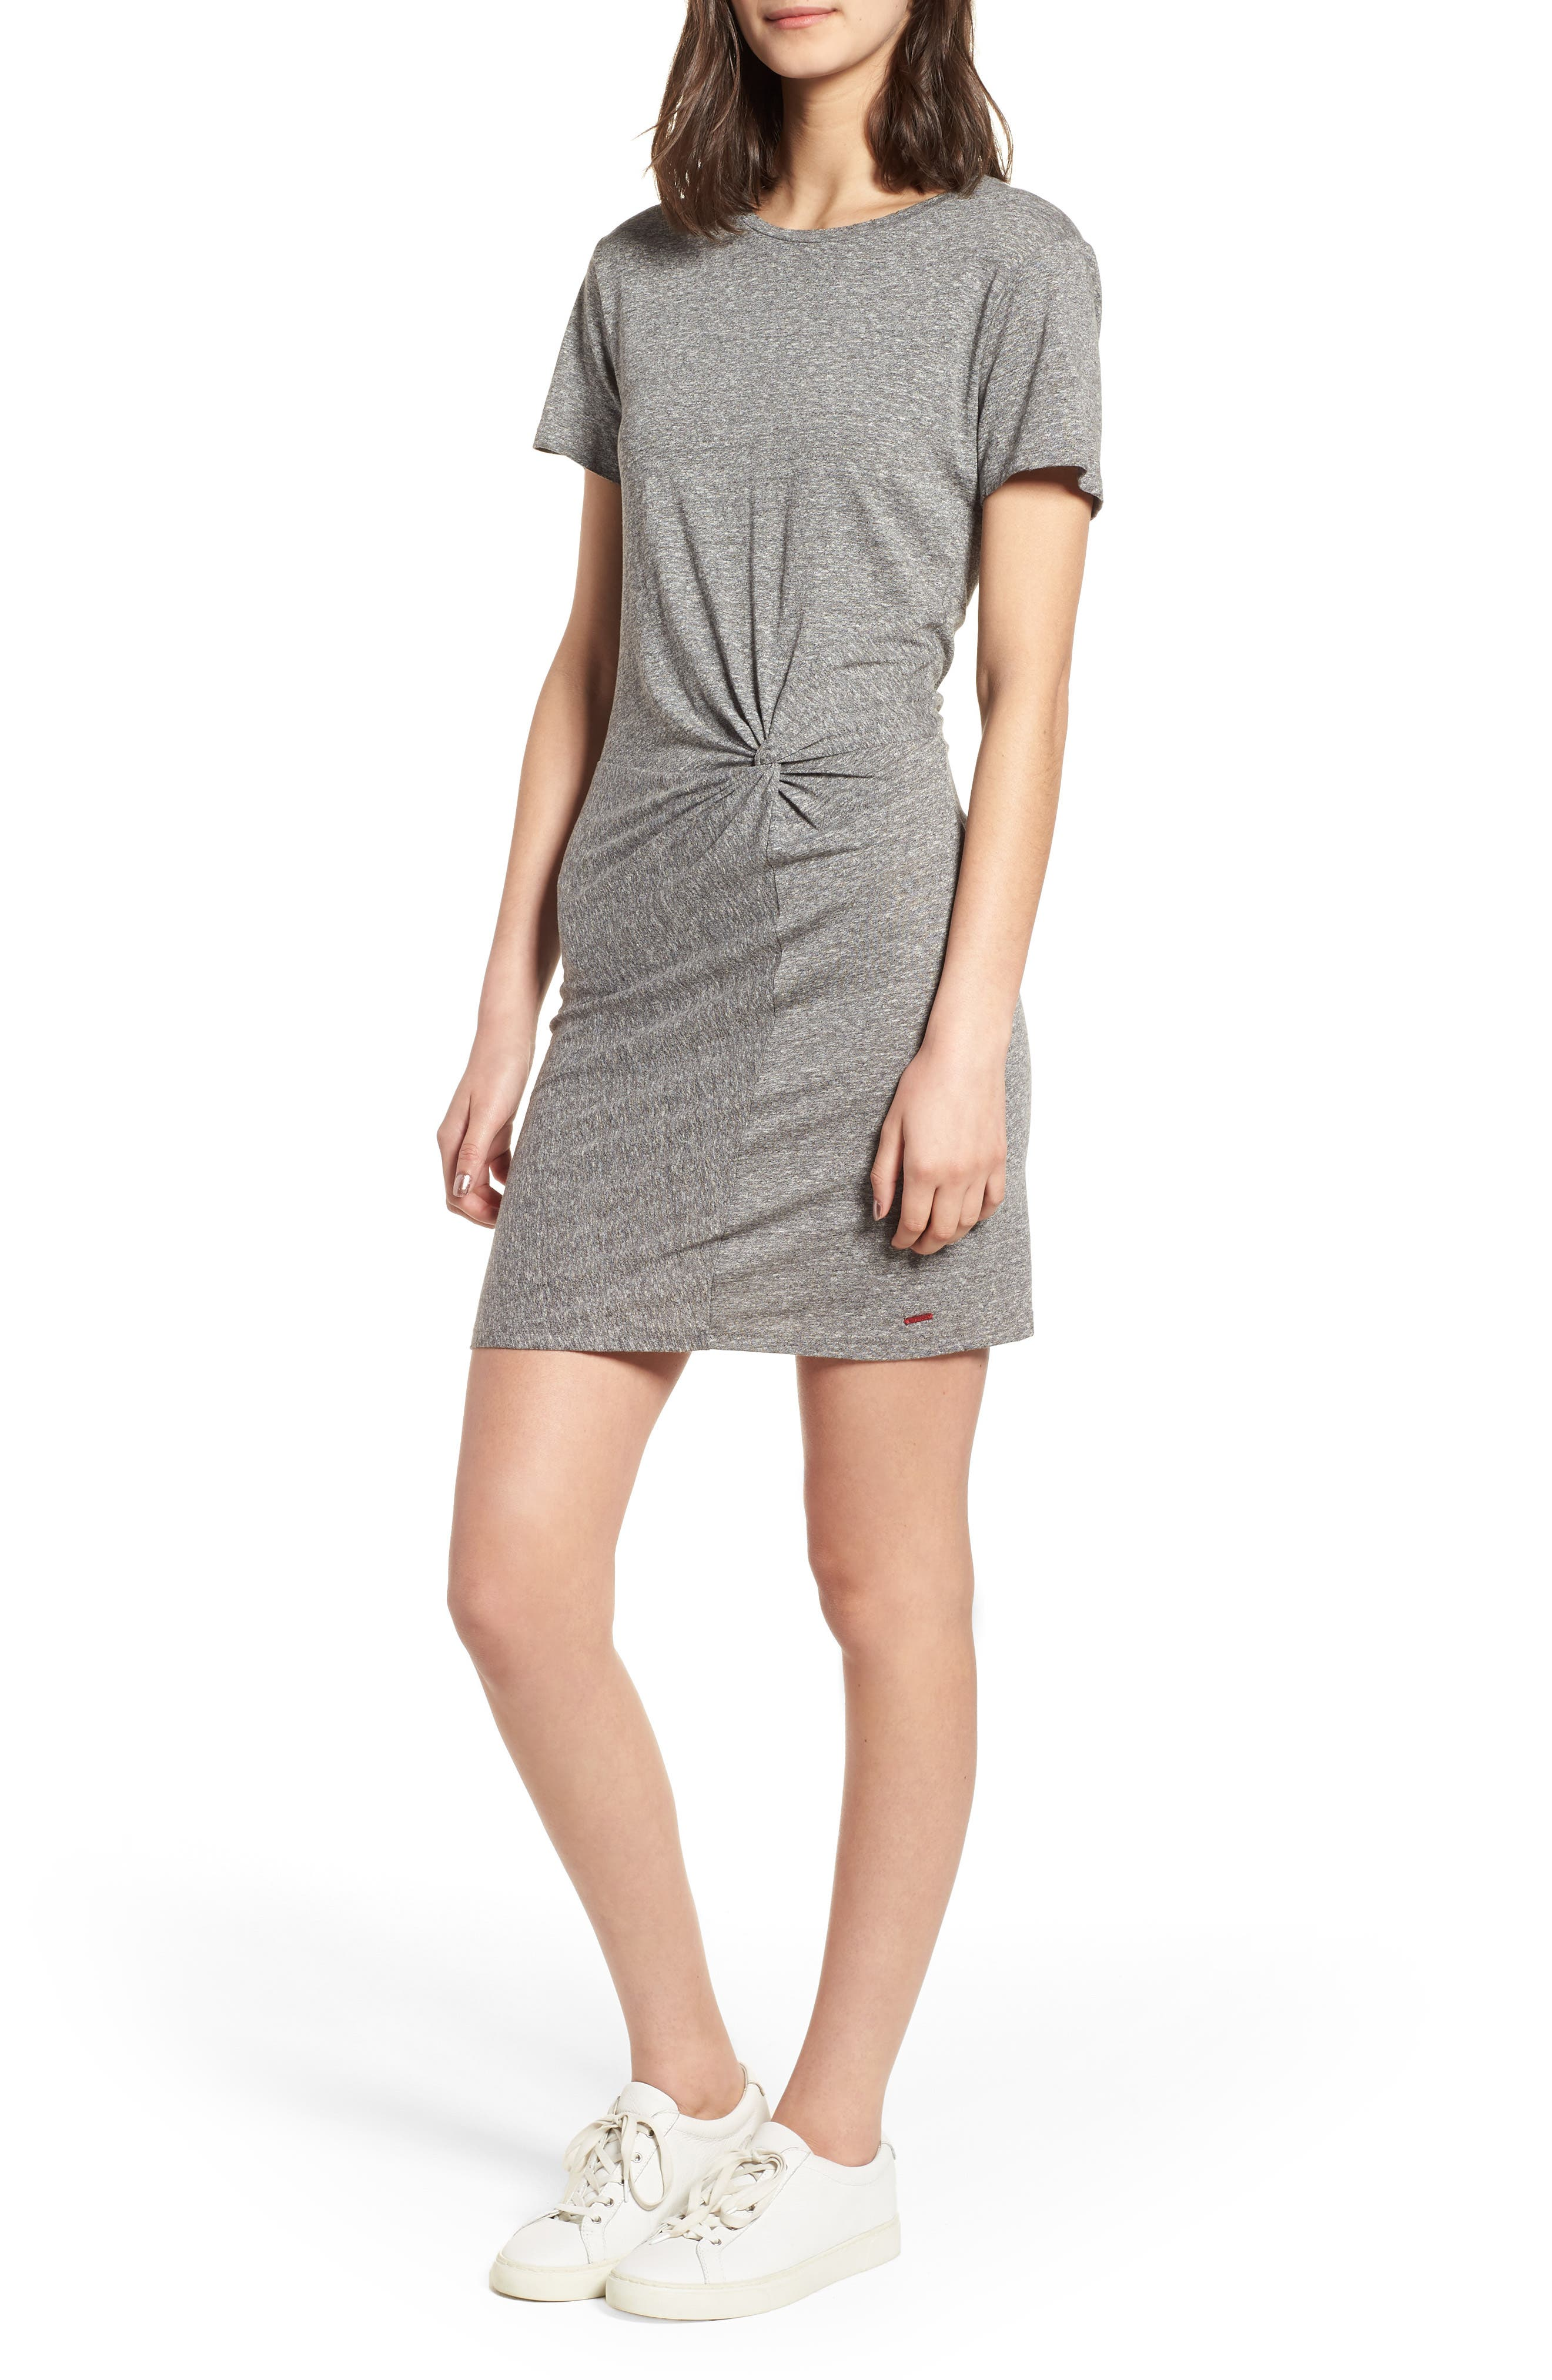 Jazz Twisted T-Shirt Dress,                         Main,                         color, Heather Grey